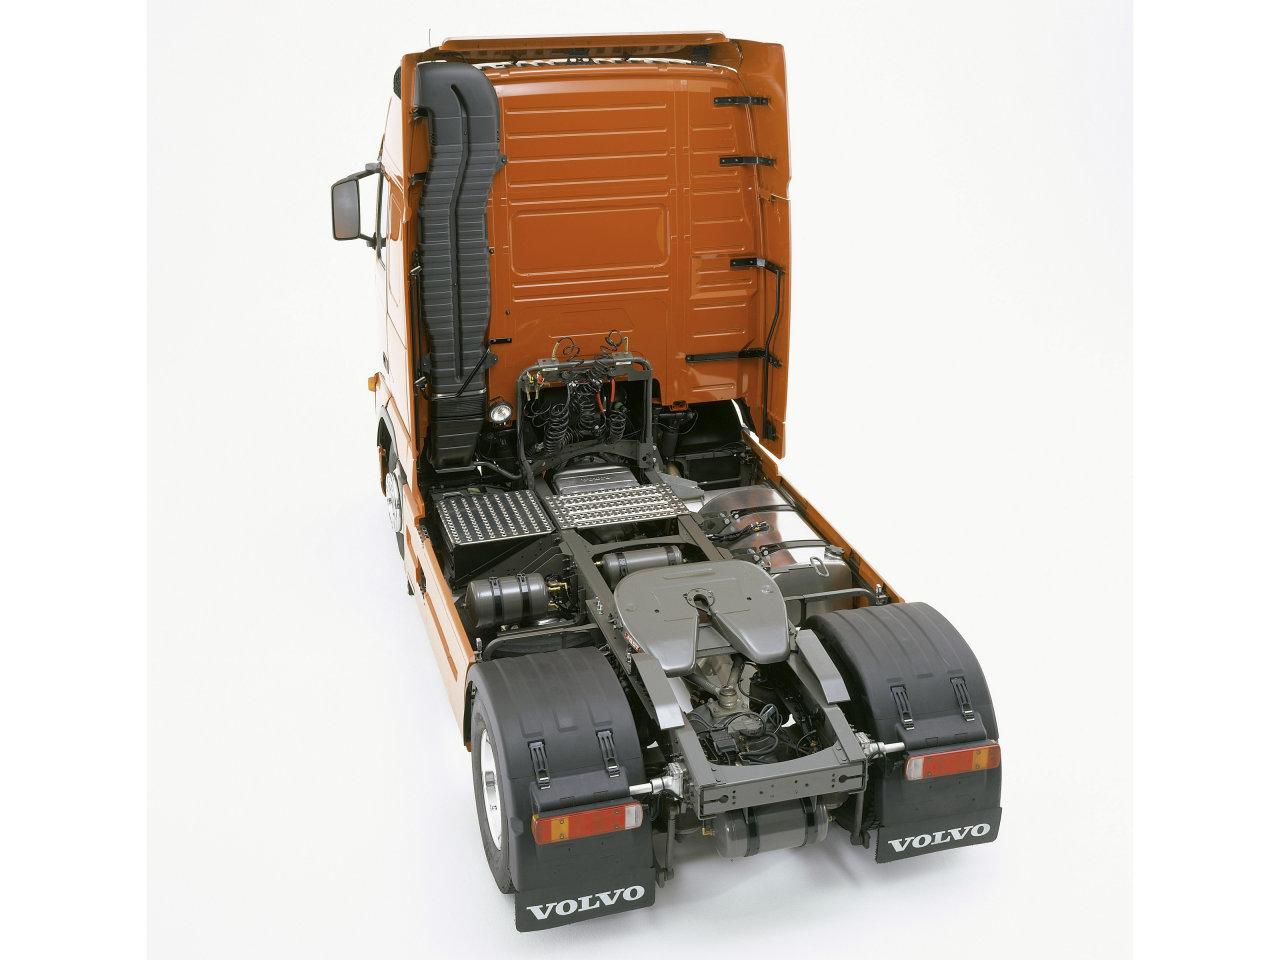 http://img7.autonavigator.ru/carsfoto/1280/16852/267610/Volvo_FH_Artic_2002.jpg